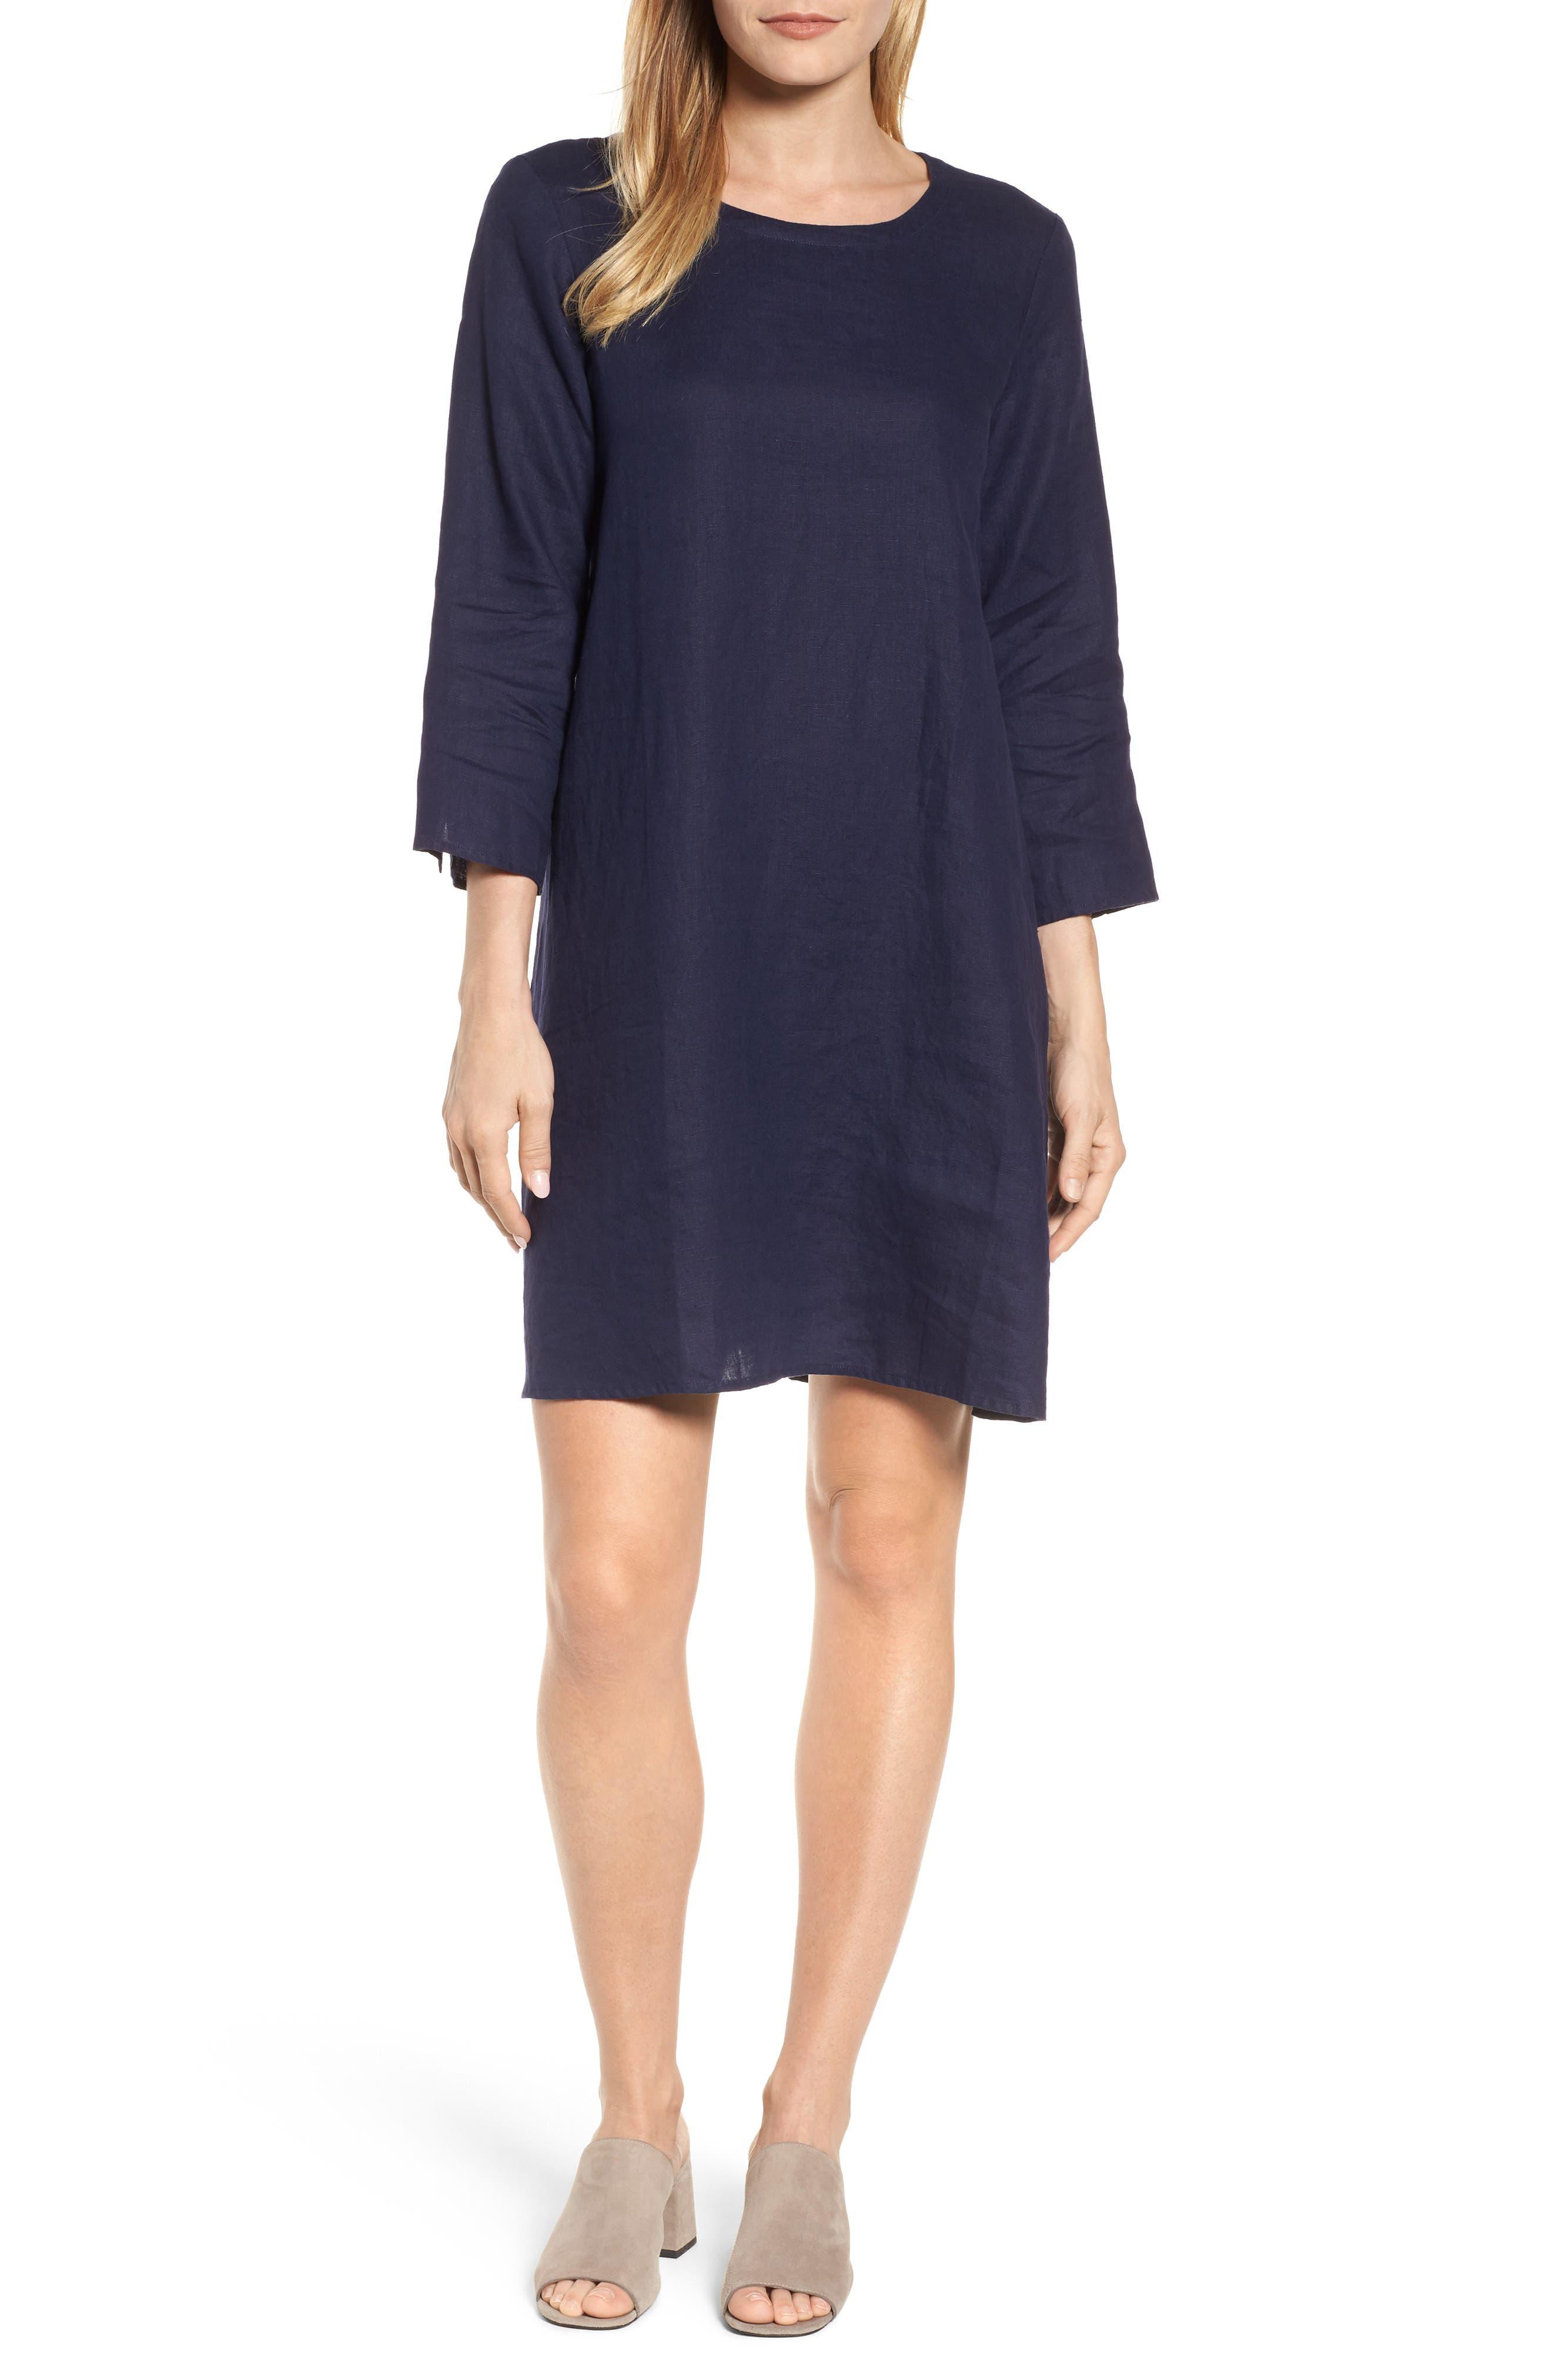 Alternate Image 1 Selected - Eileen Fisher Organic Linen Round Neck Shift Dress